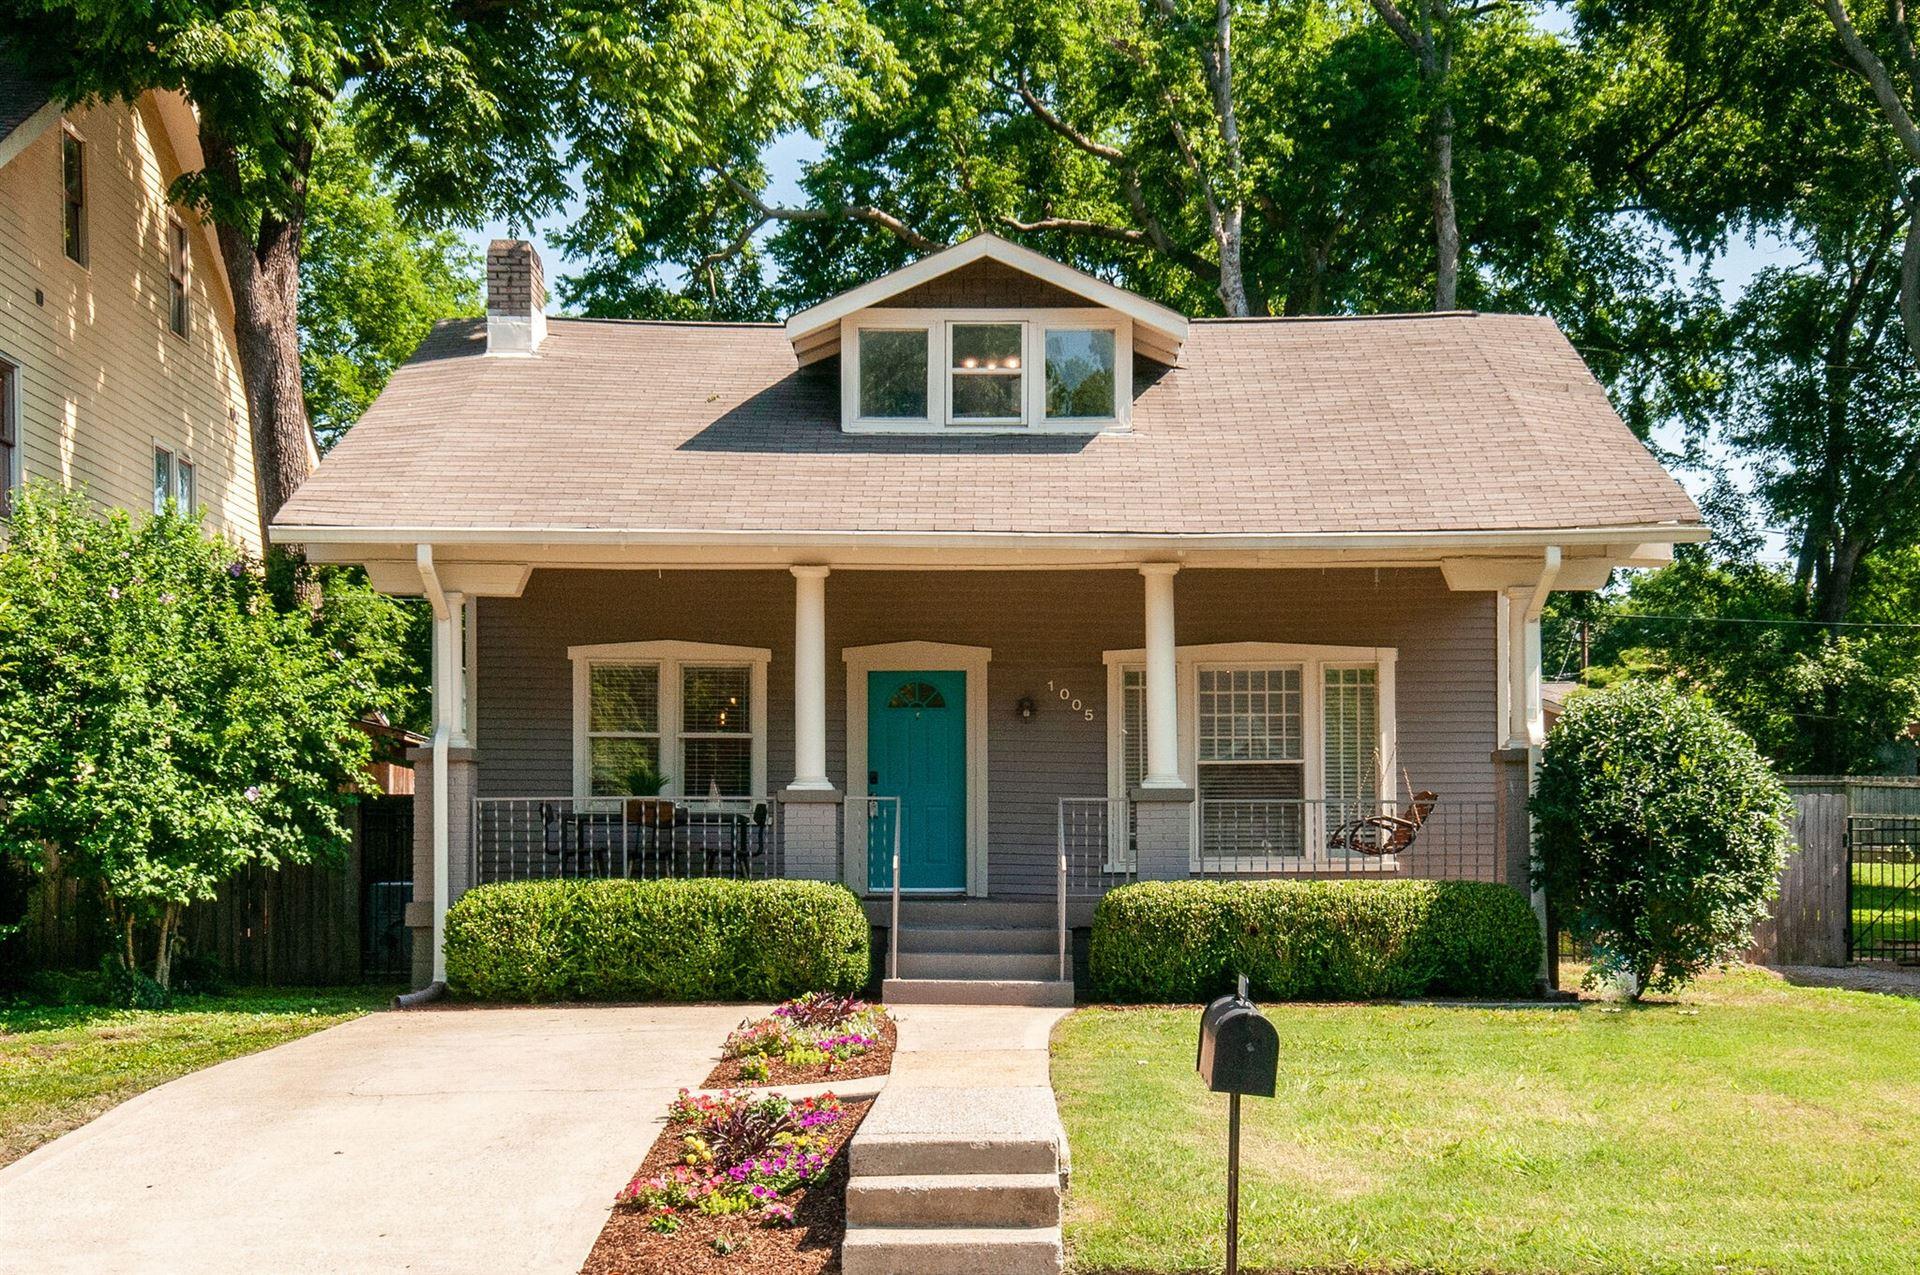 Photo of 1005 Chicamauga Ave, Nashville, TN 37206 (MLS # 2263602)